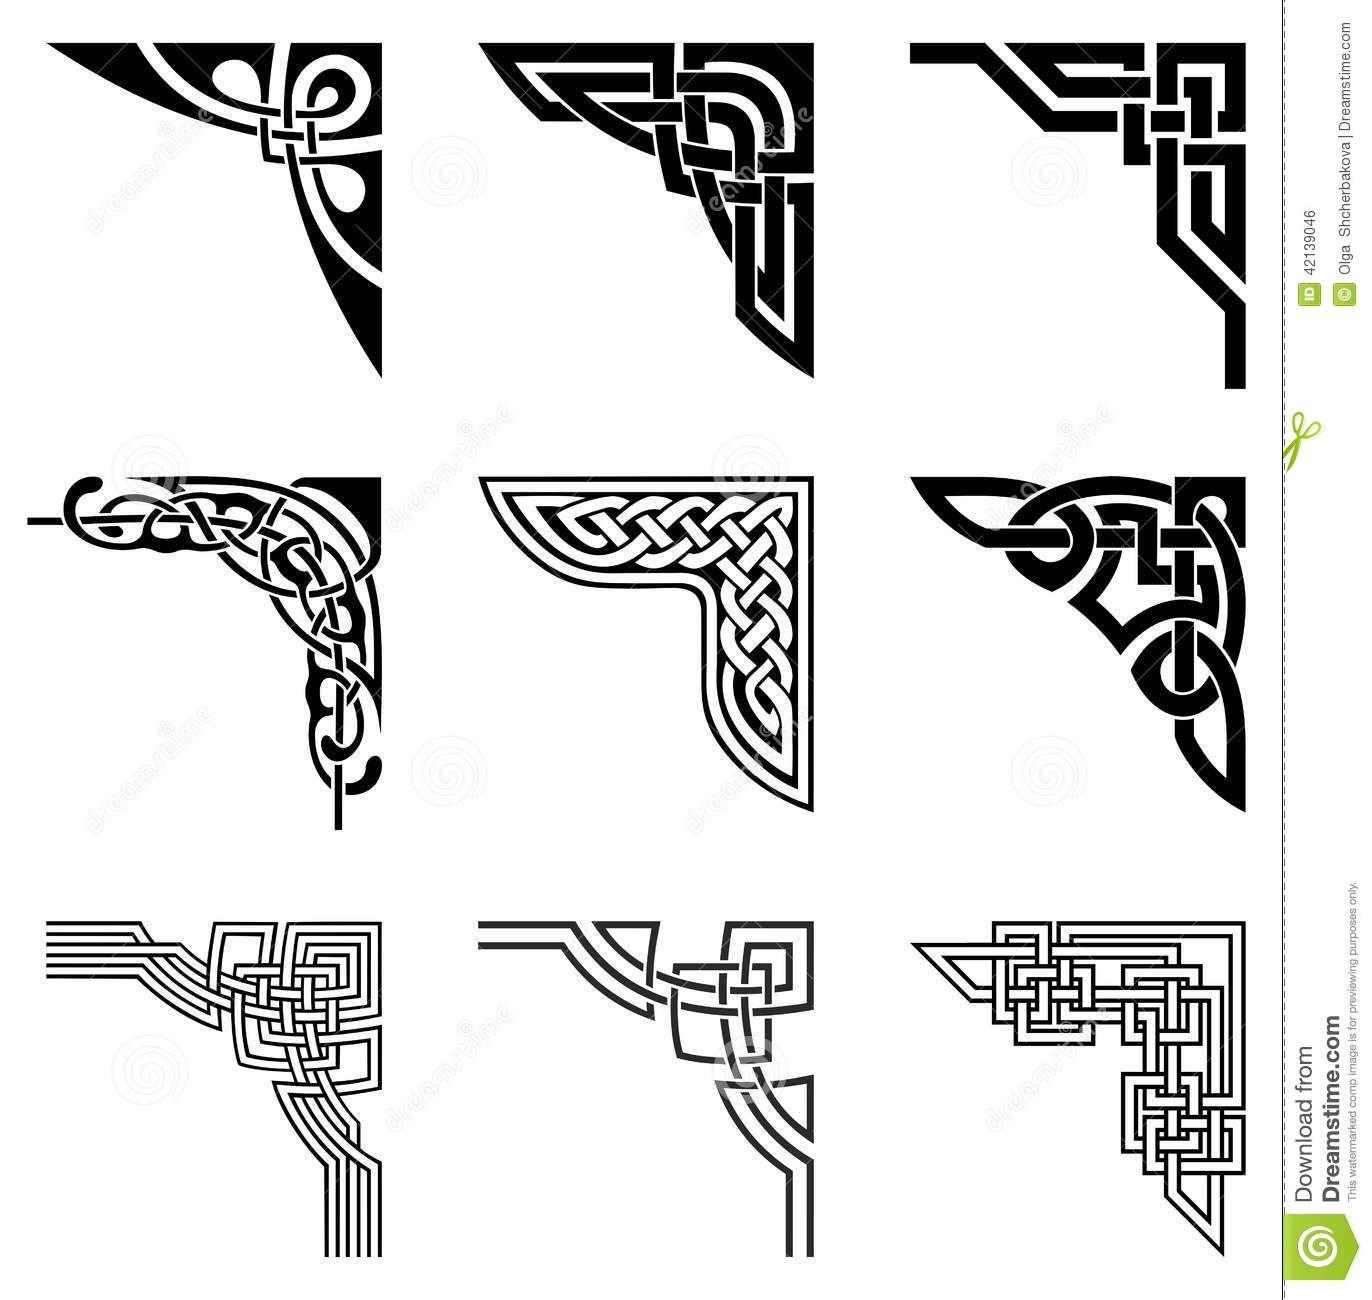 esquinas de flores para colorear - Buscar con Google | Celtic things ...